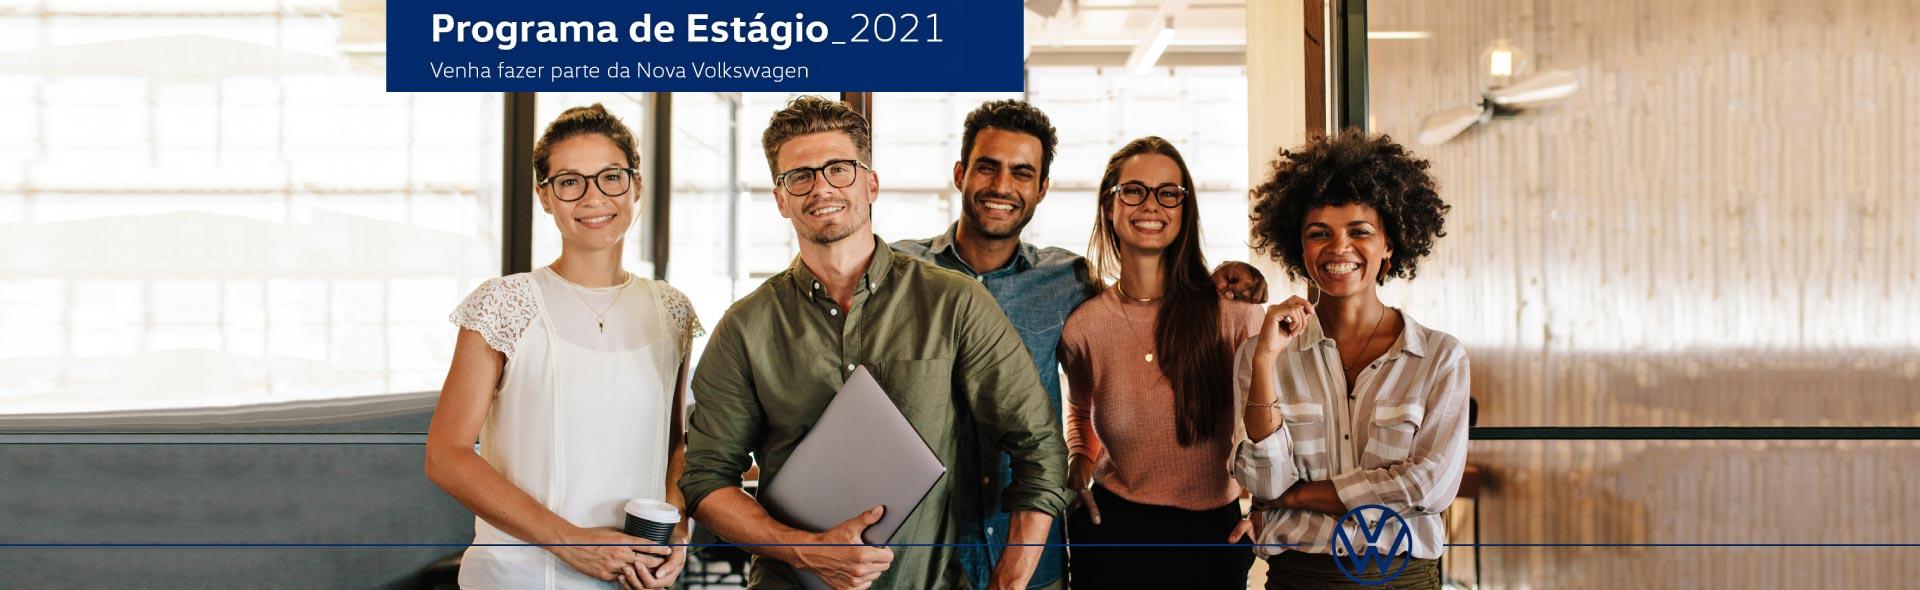 Programa de Estágio 2021 - Venha fazer parte da Nova Volkswagen